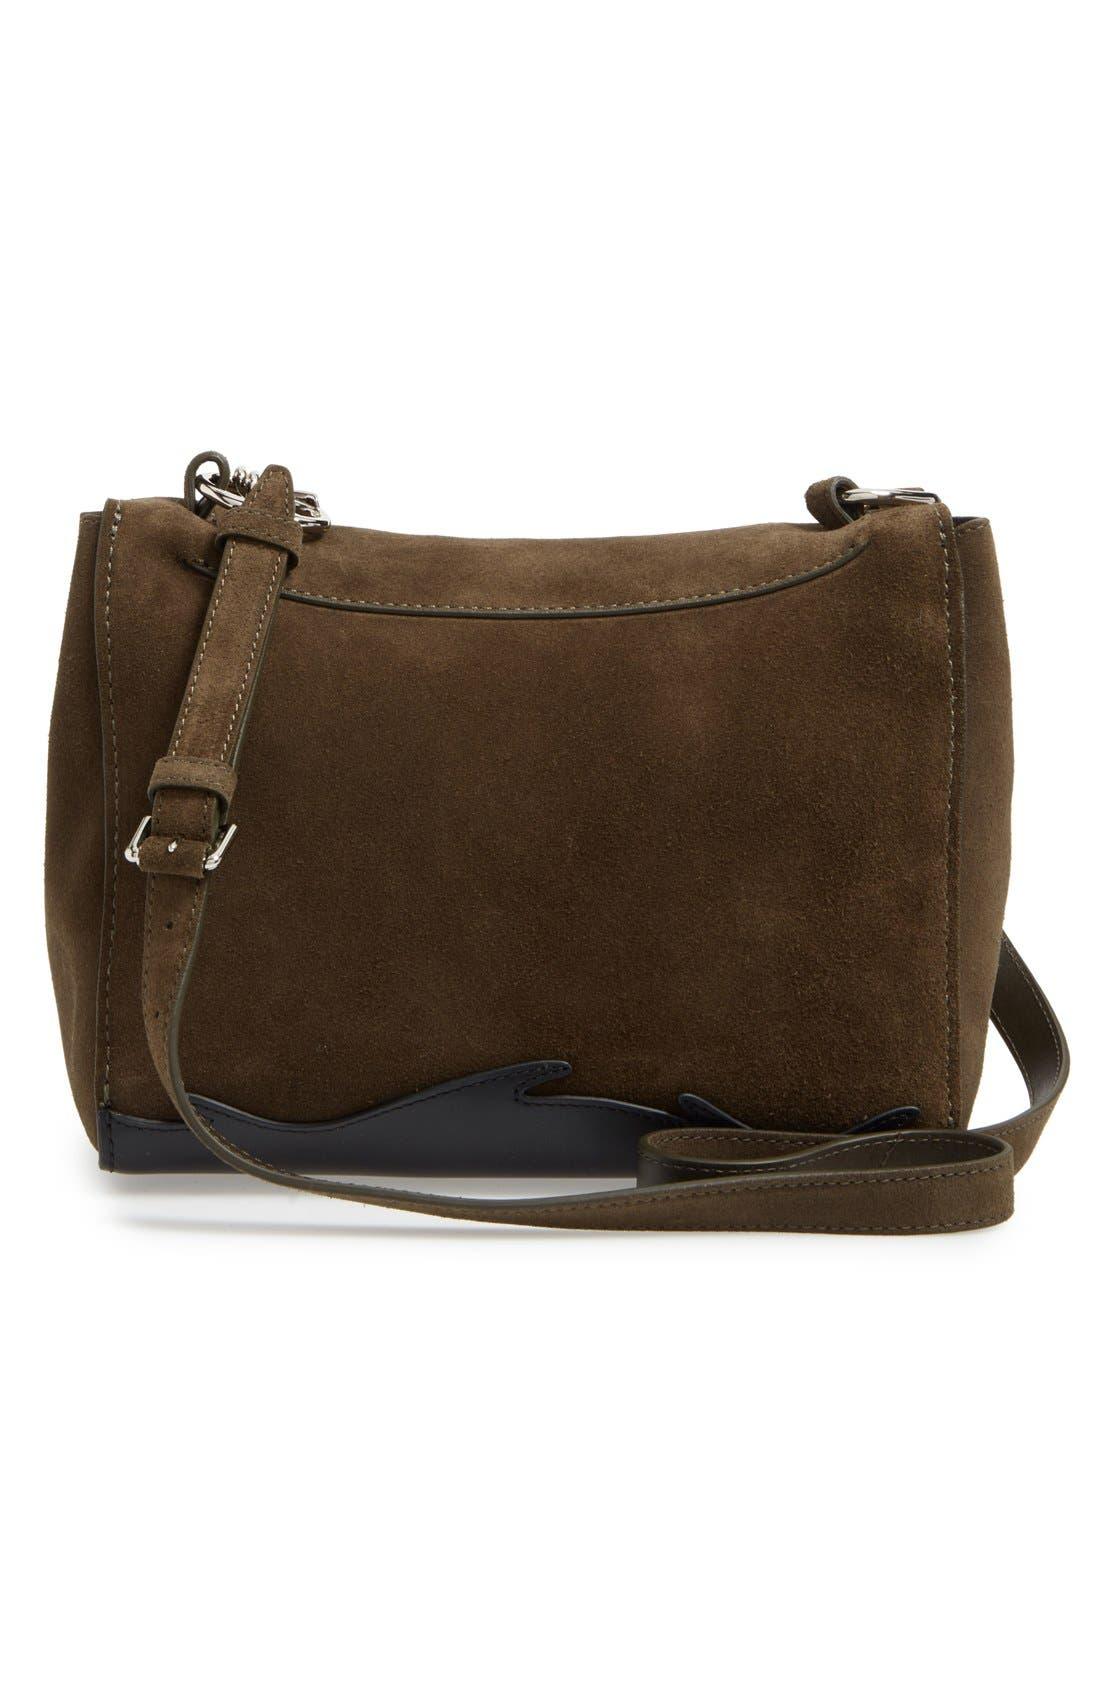 Alternate Image 3  - 3.1 Phillip Lim 'Ames - Patchwork' Leather Crossbody Bag